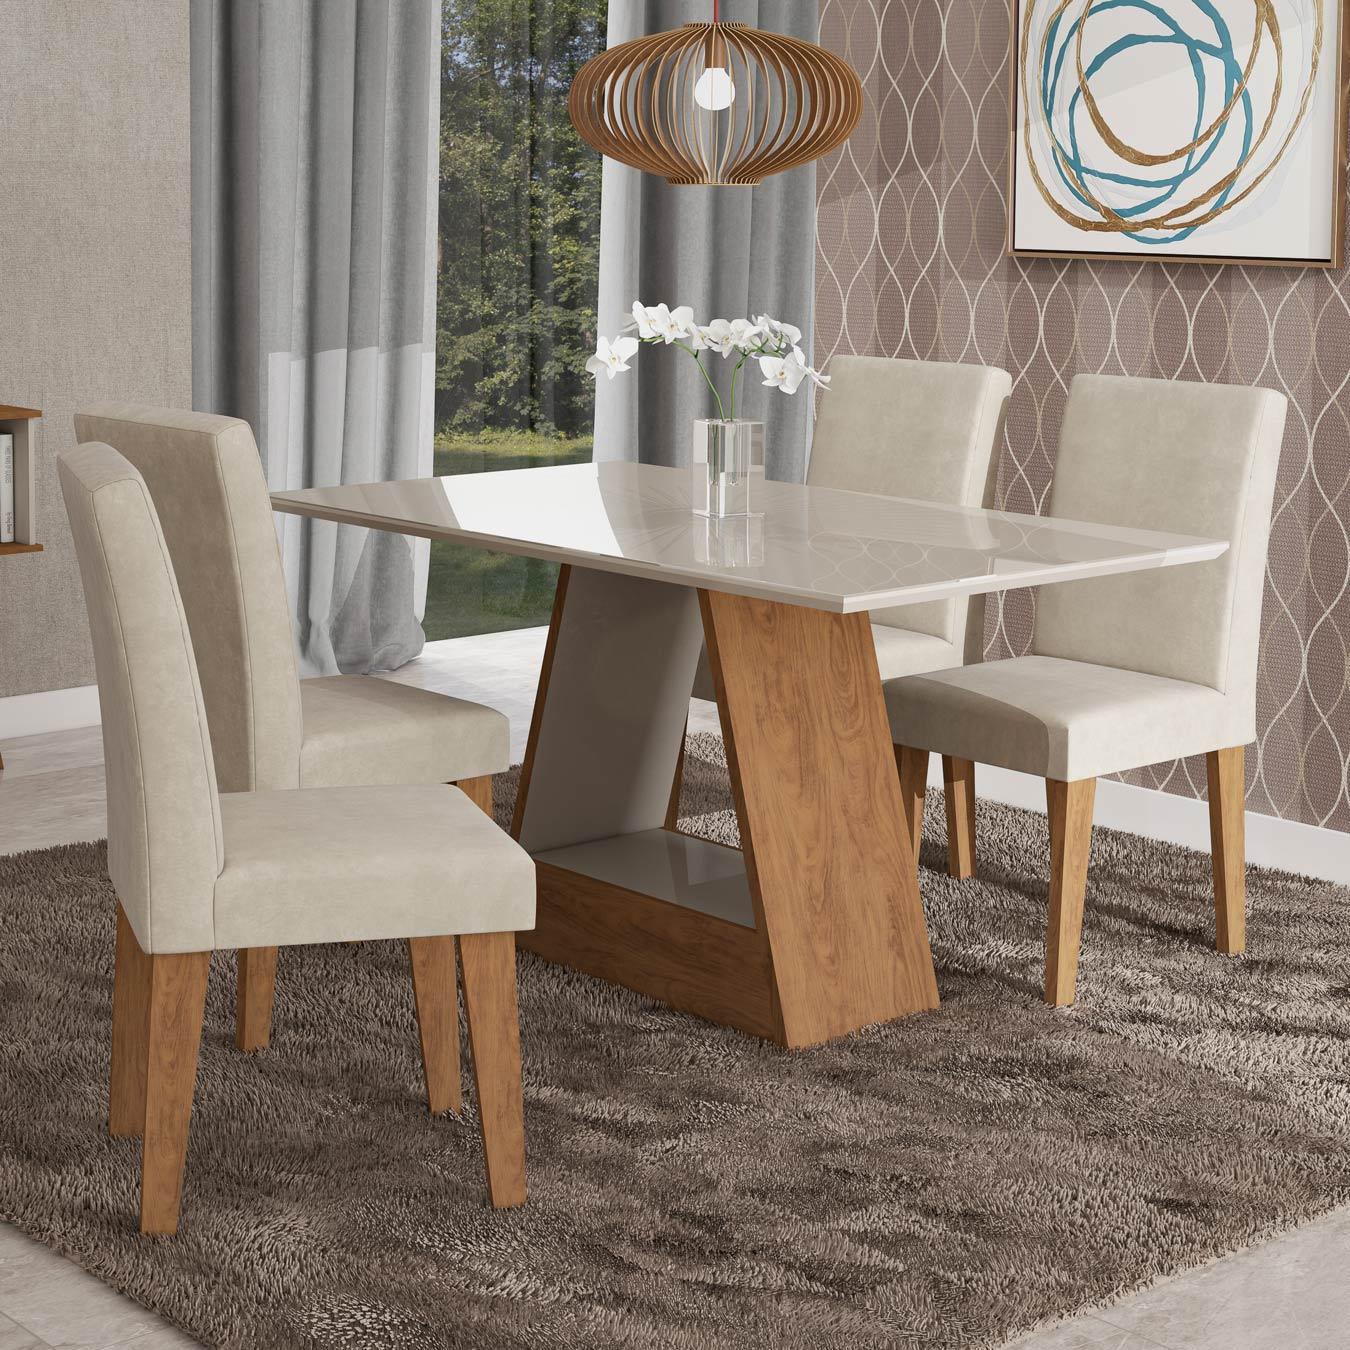 Mesa para Sala de Jantar Alana 130 x 80 cm e 4 Cadeiras Milena Cimol Savana/Off White/Bege